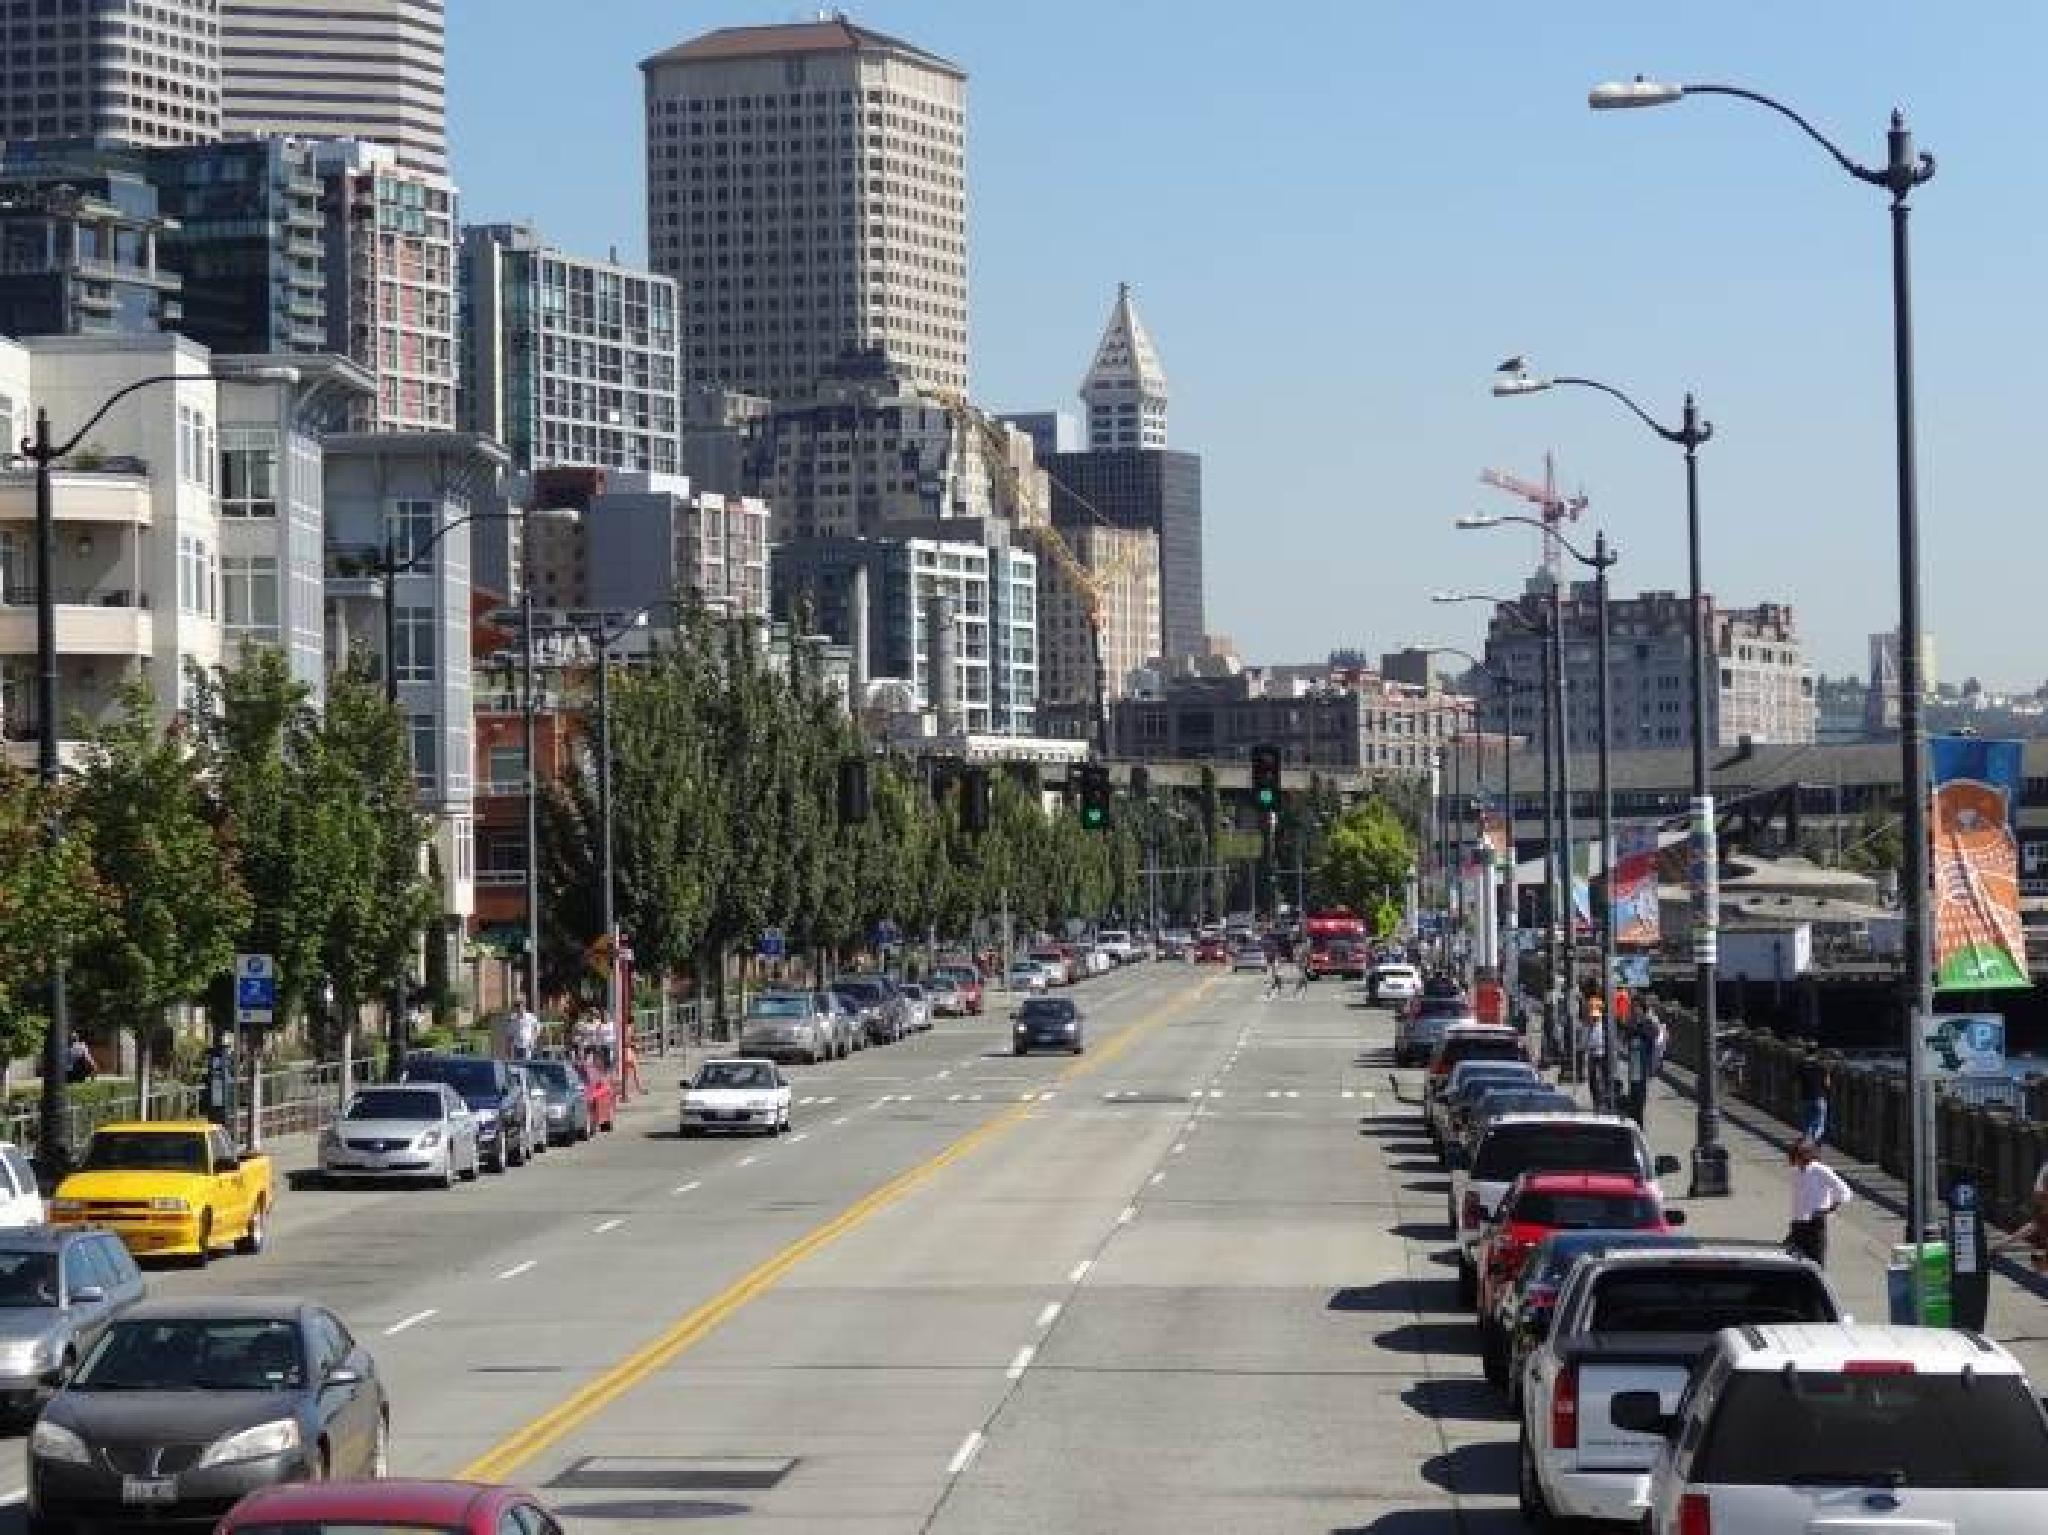 Seattle, Washington, USA by riddelljane